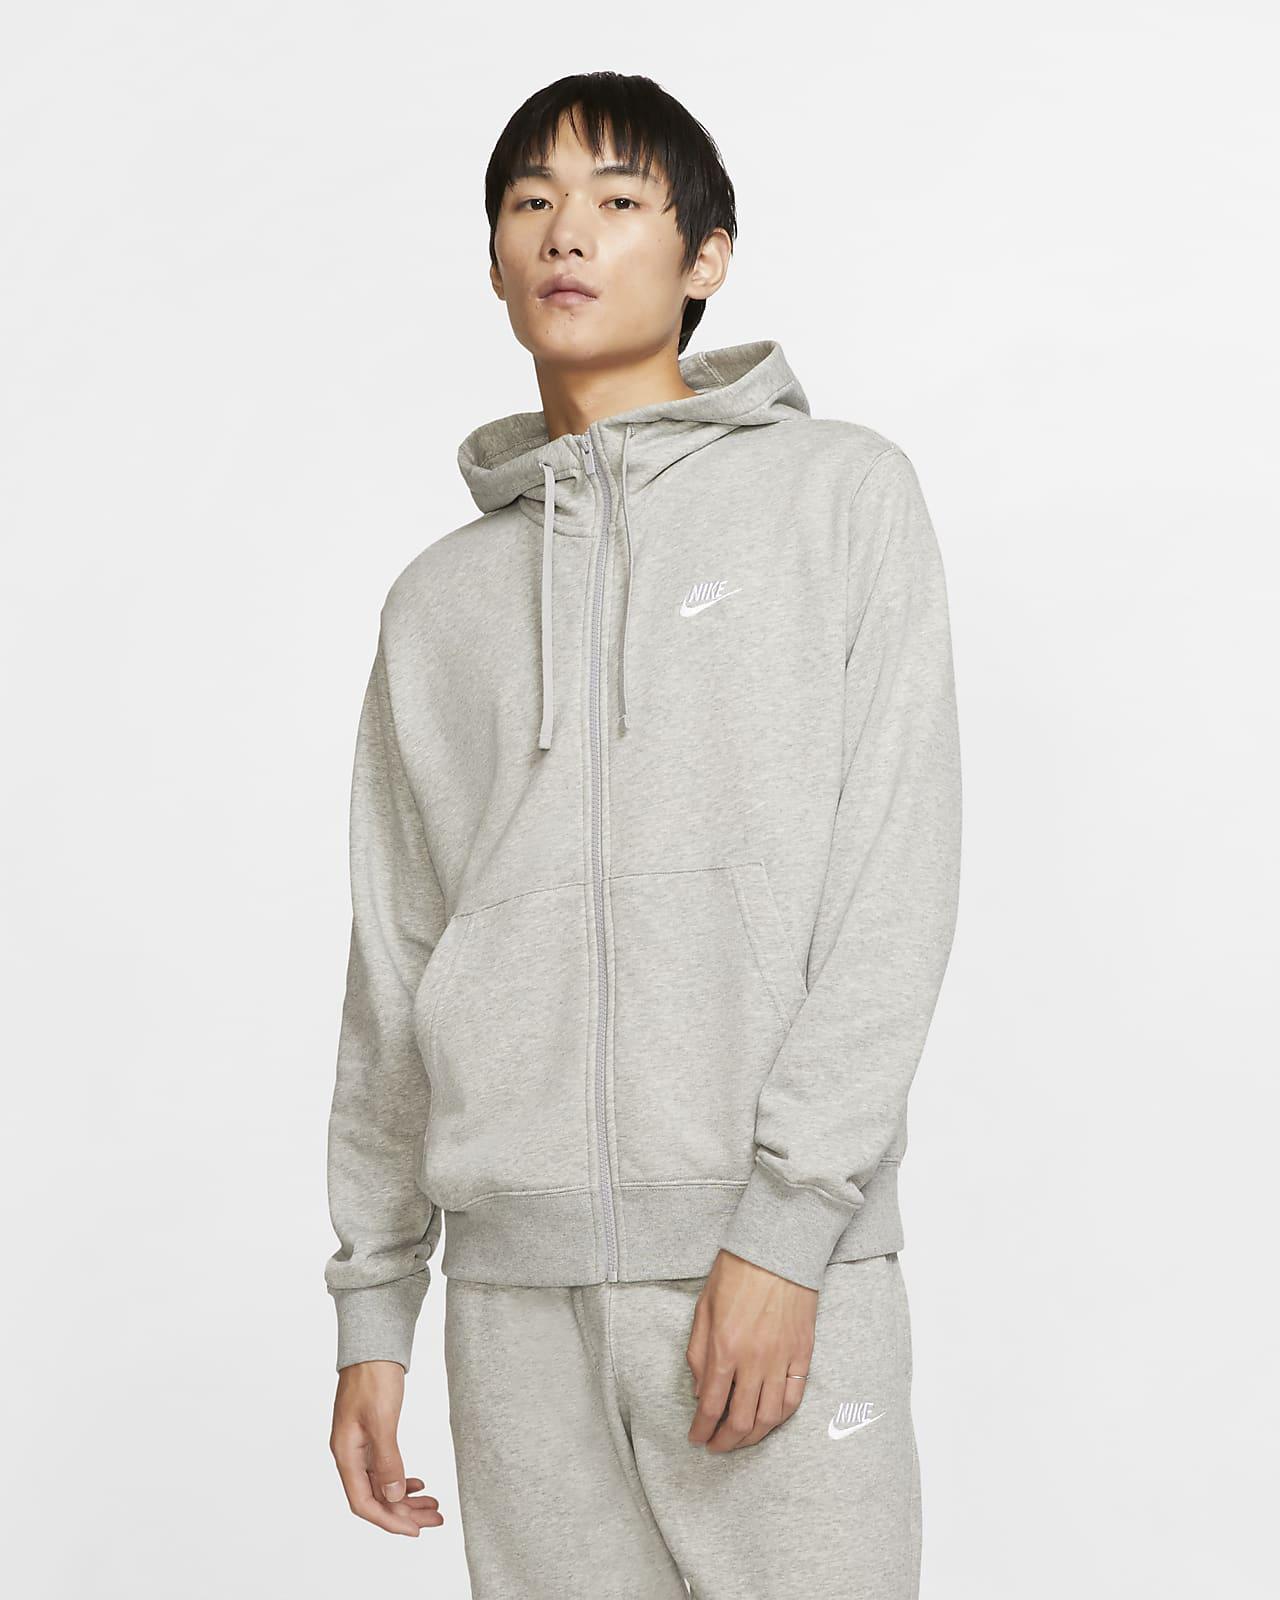 Мужская худи с молнией во всю длину Nike Sportswear Club